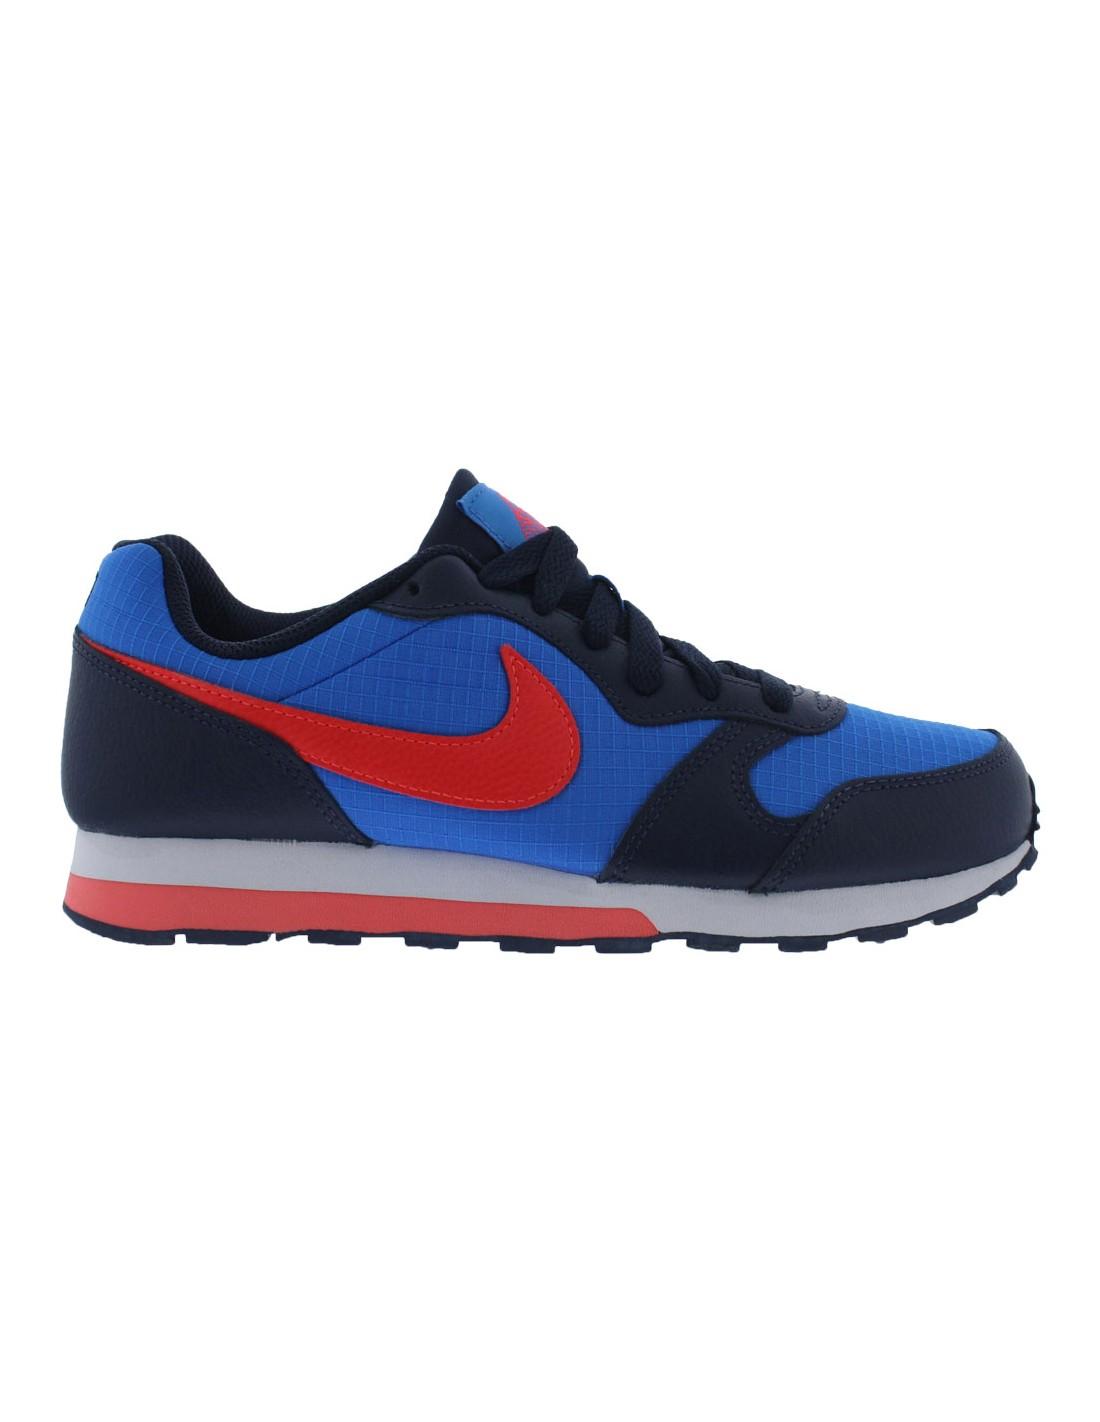 Nike 2 Blu Ragazzo Mid Runner Scarpe 3TcFK1lJu